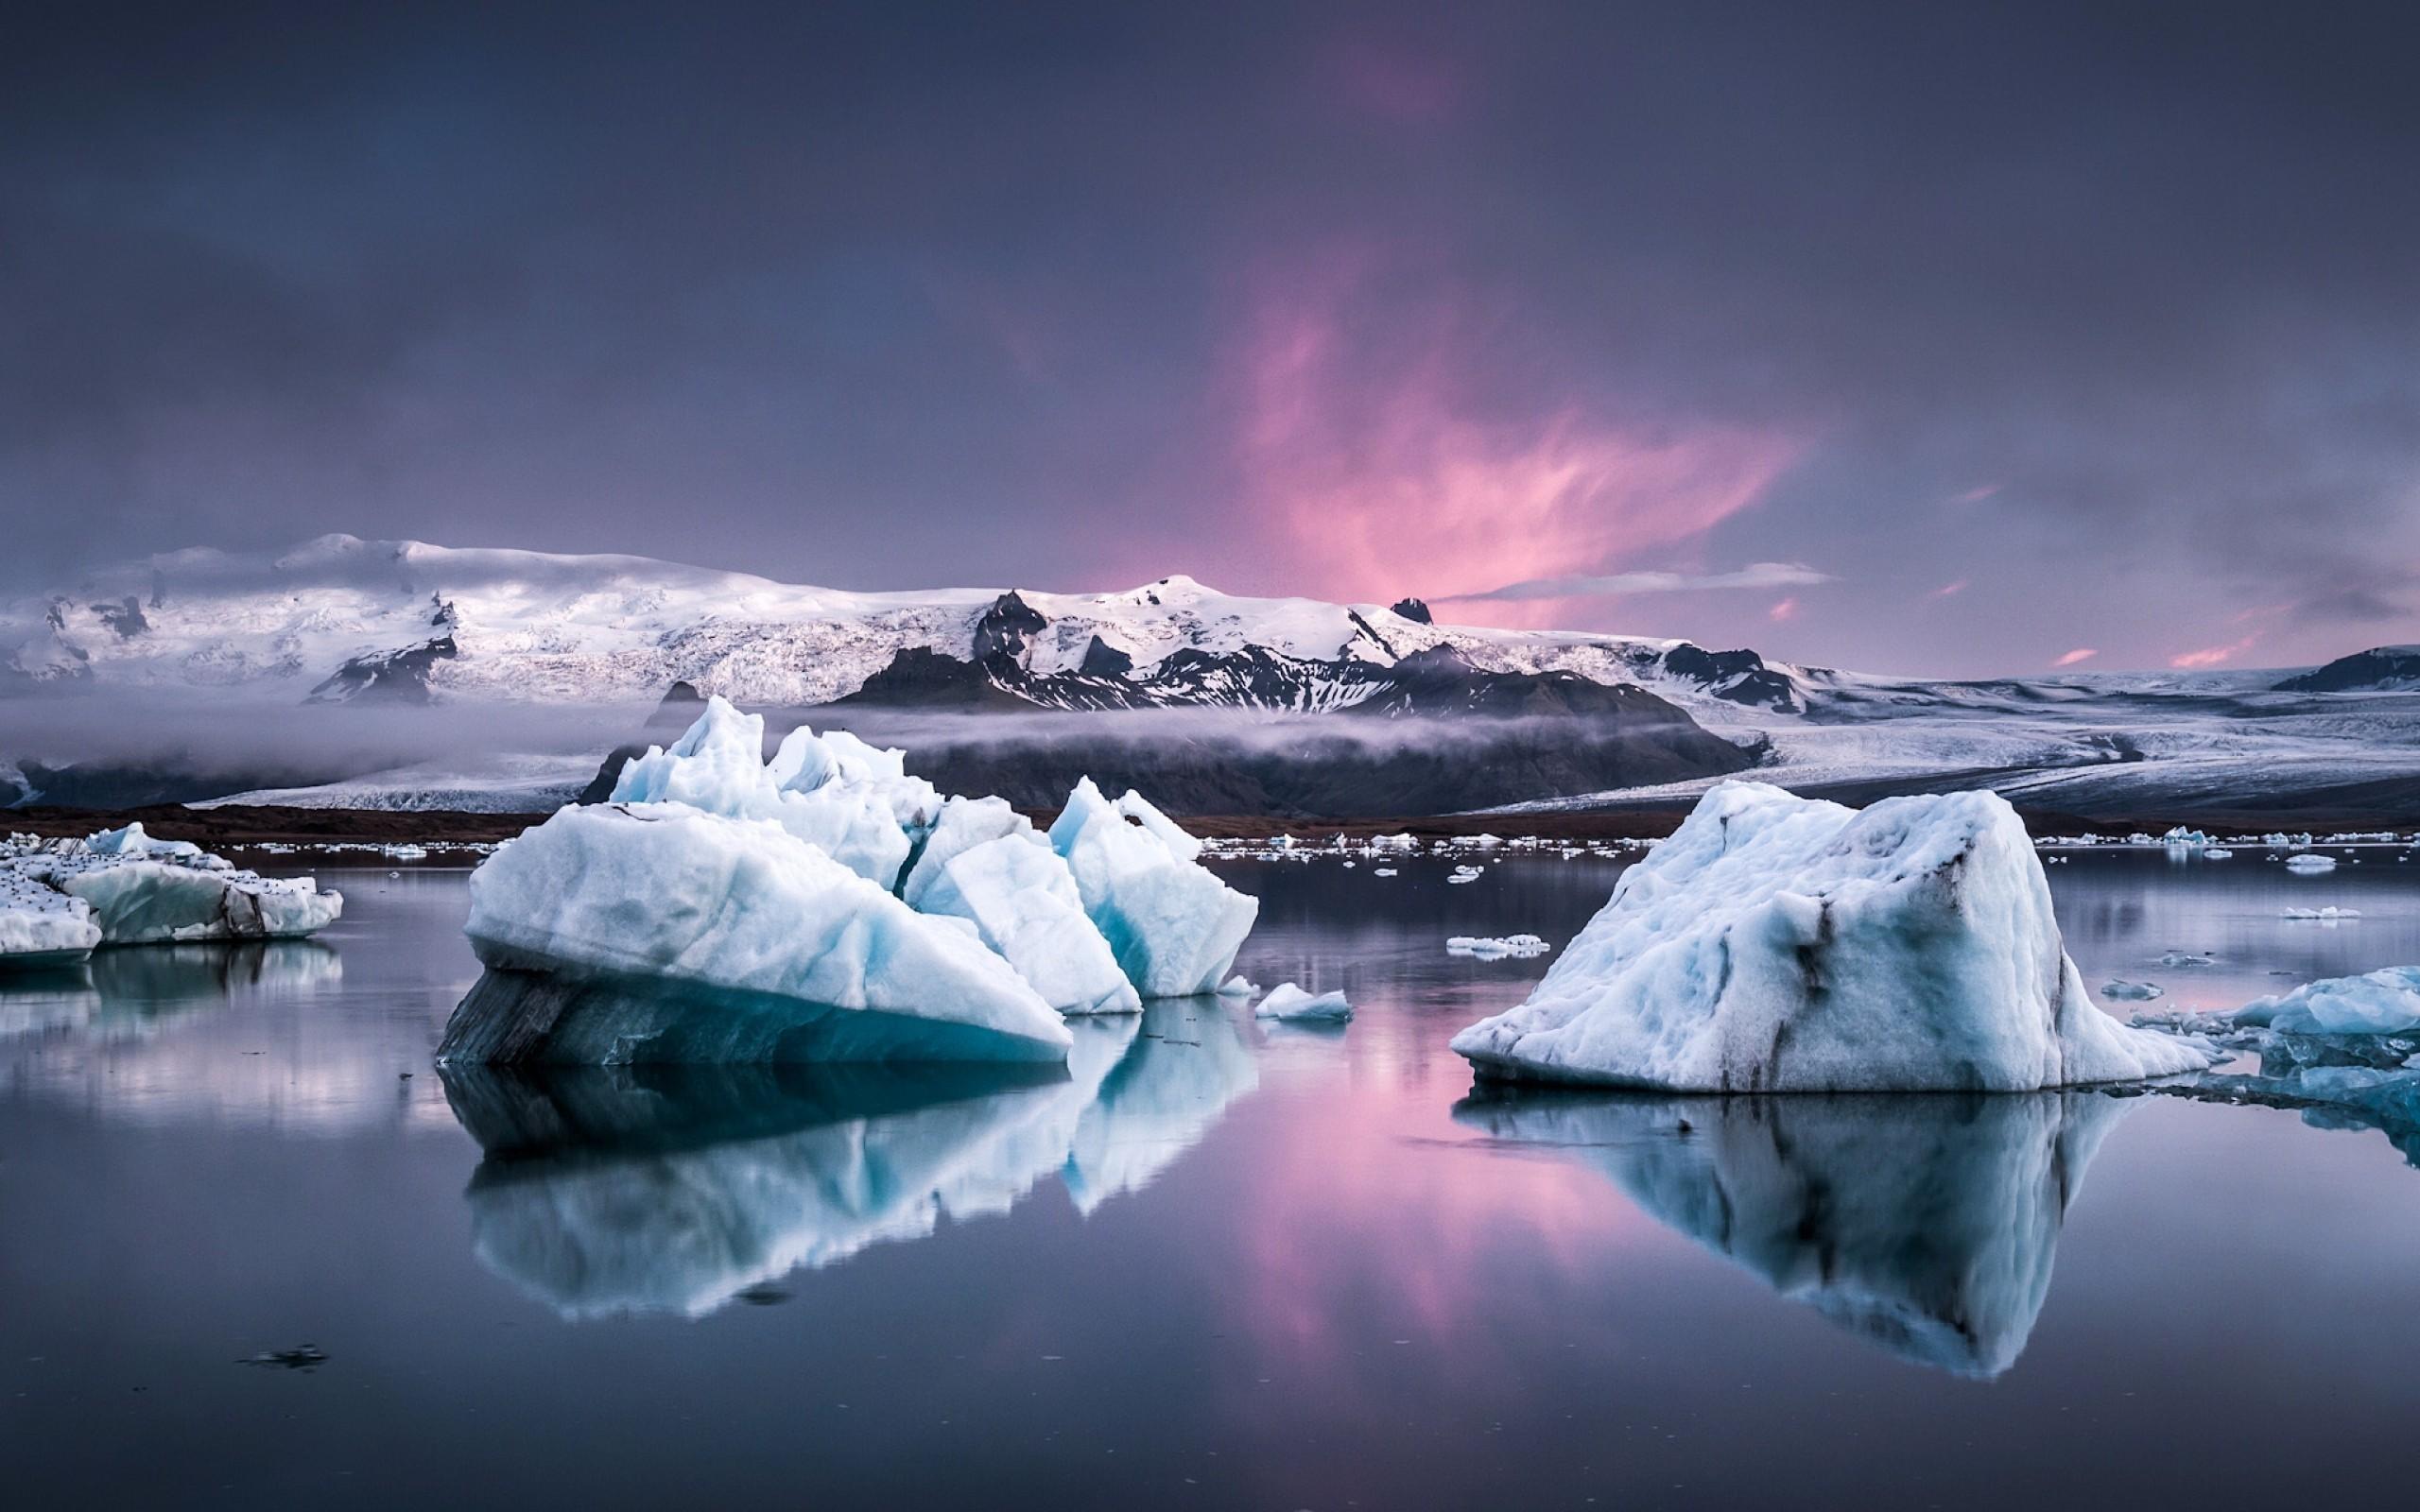 Res: 2560x1600, Glacier Wallpaper Wallpapers Browse